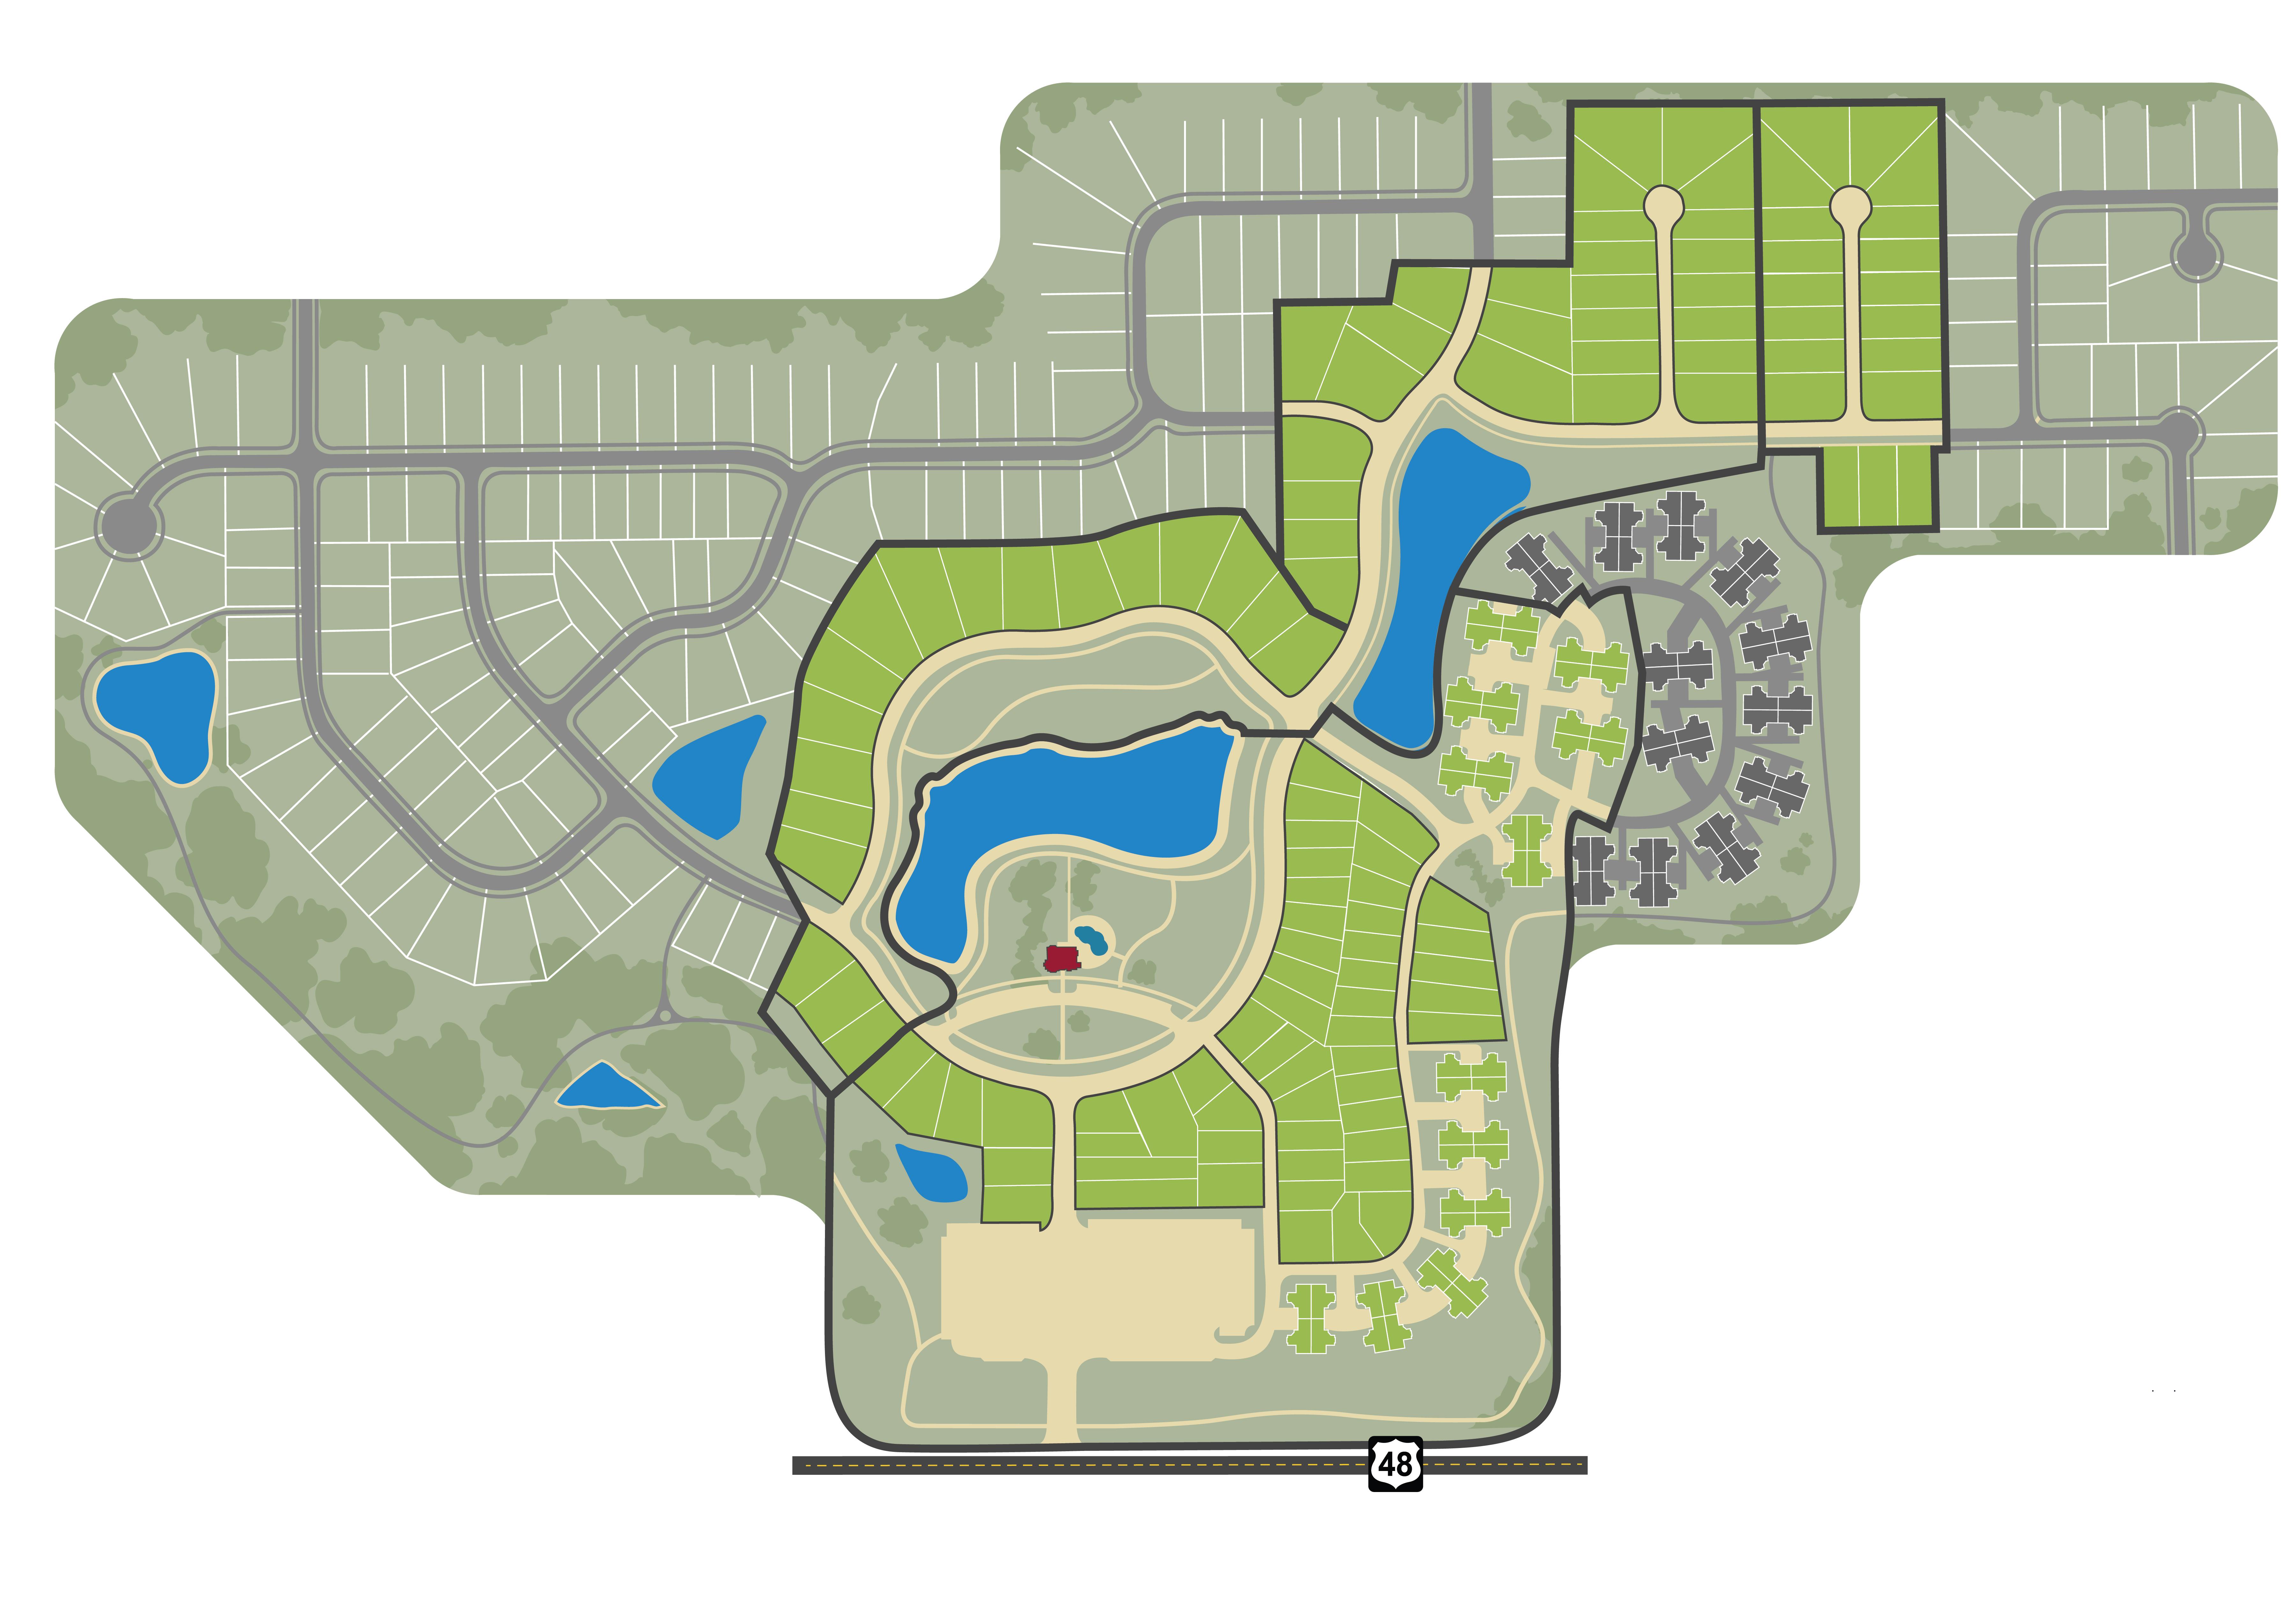 Full community map of Soraya Farms.